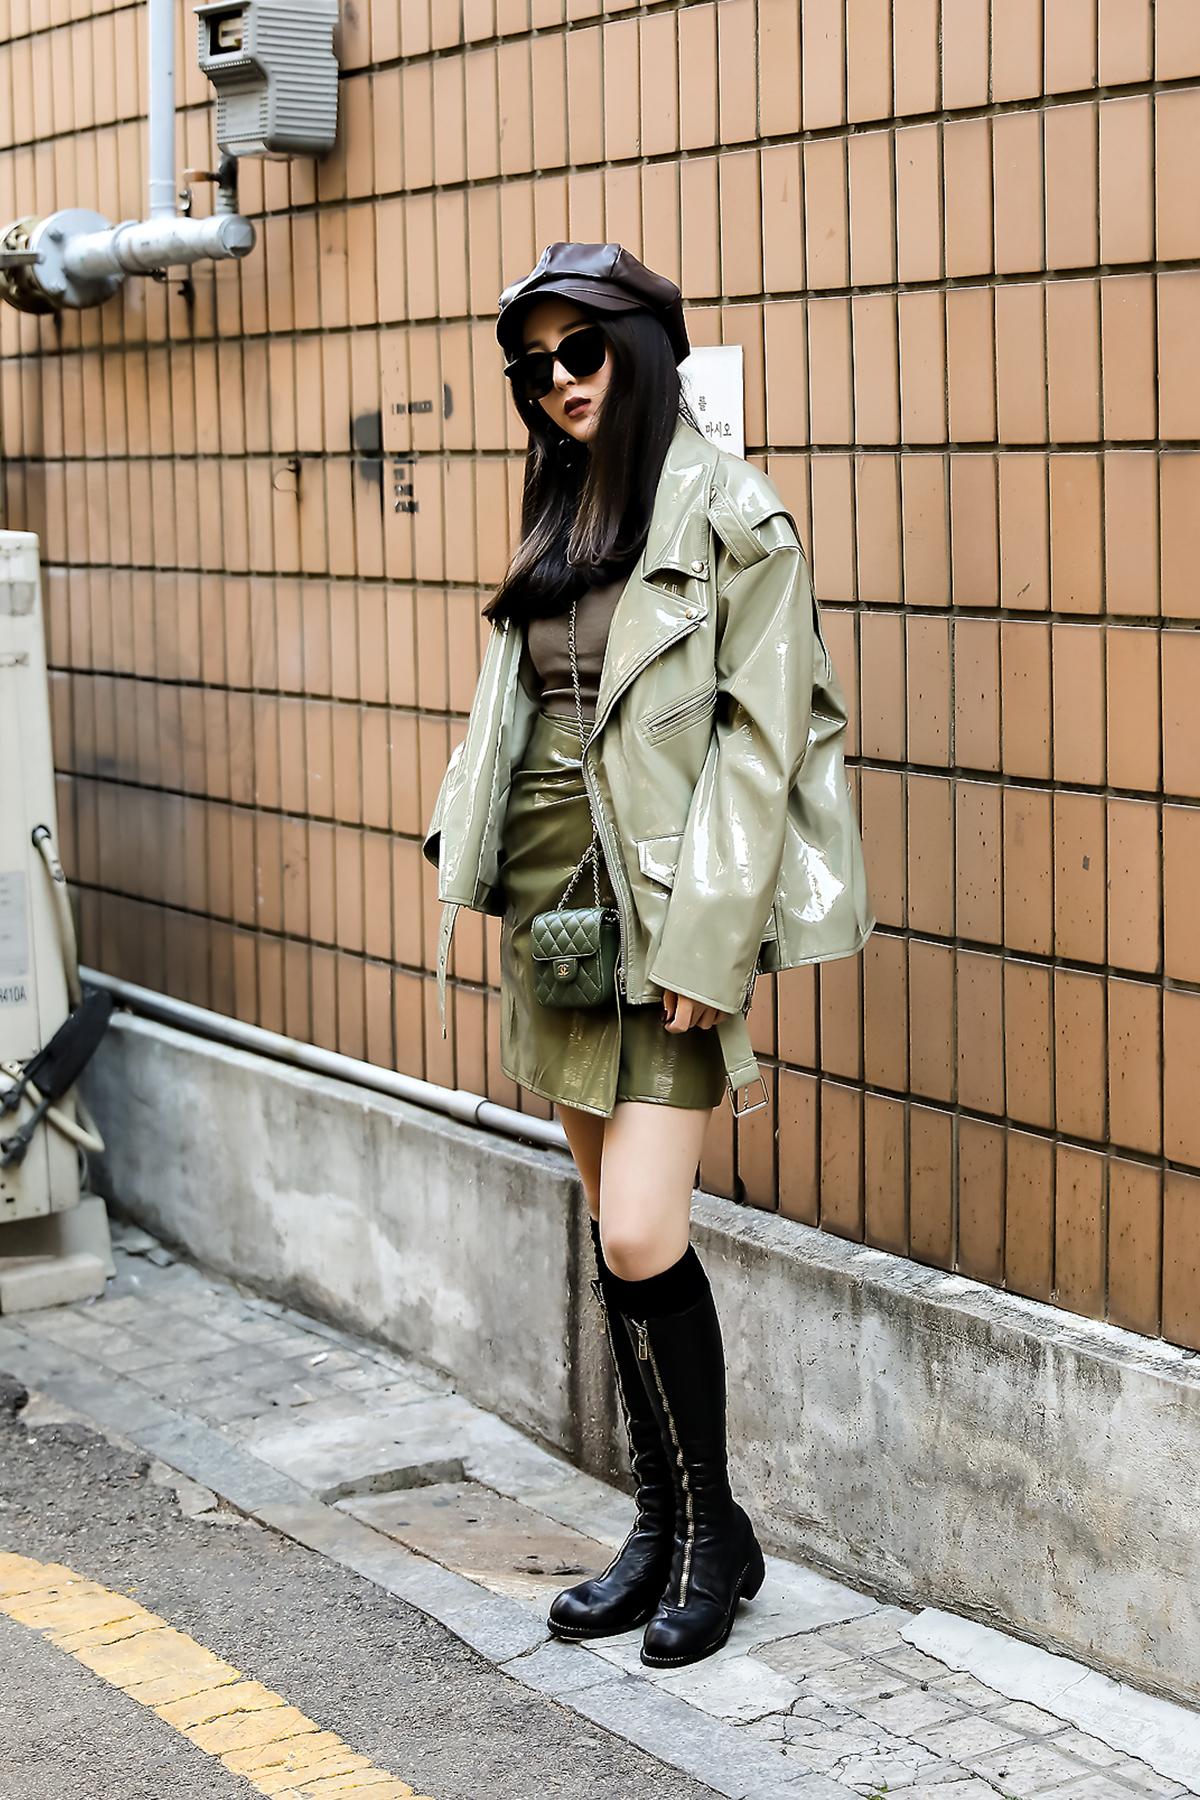 Women fall street style last week of october 2018 inseoul 13